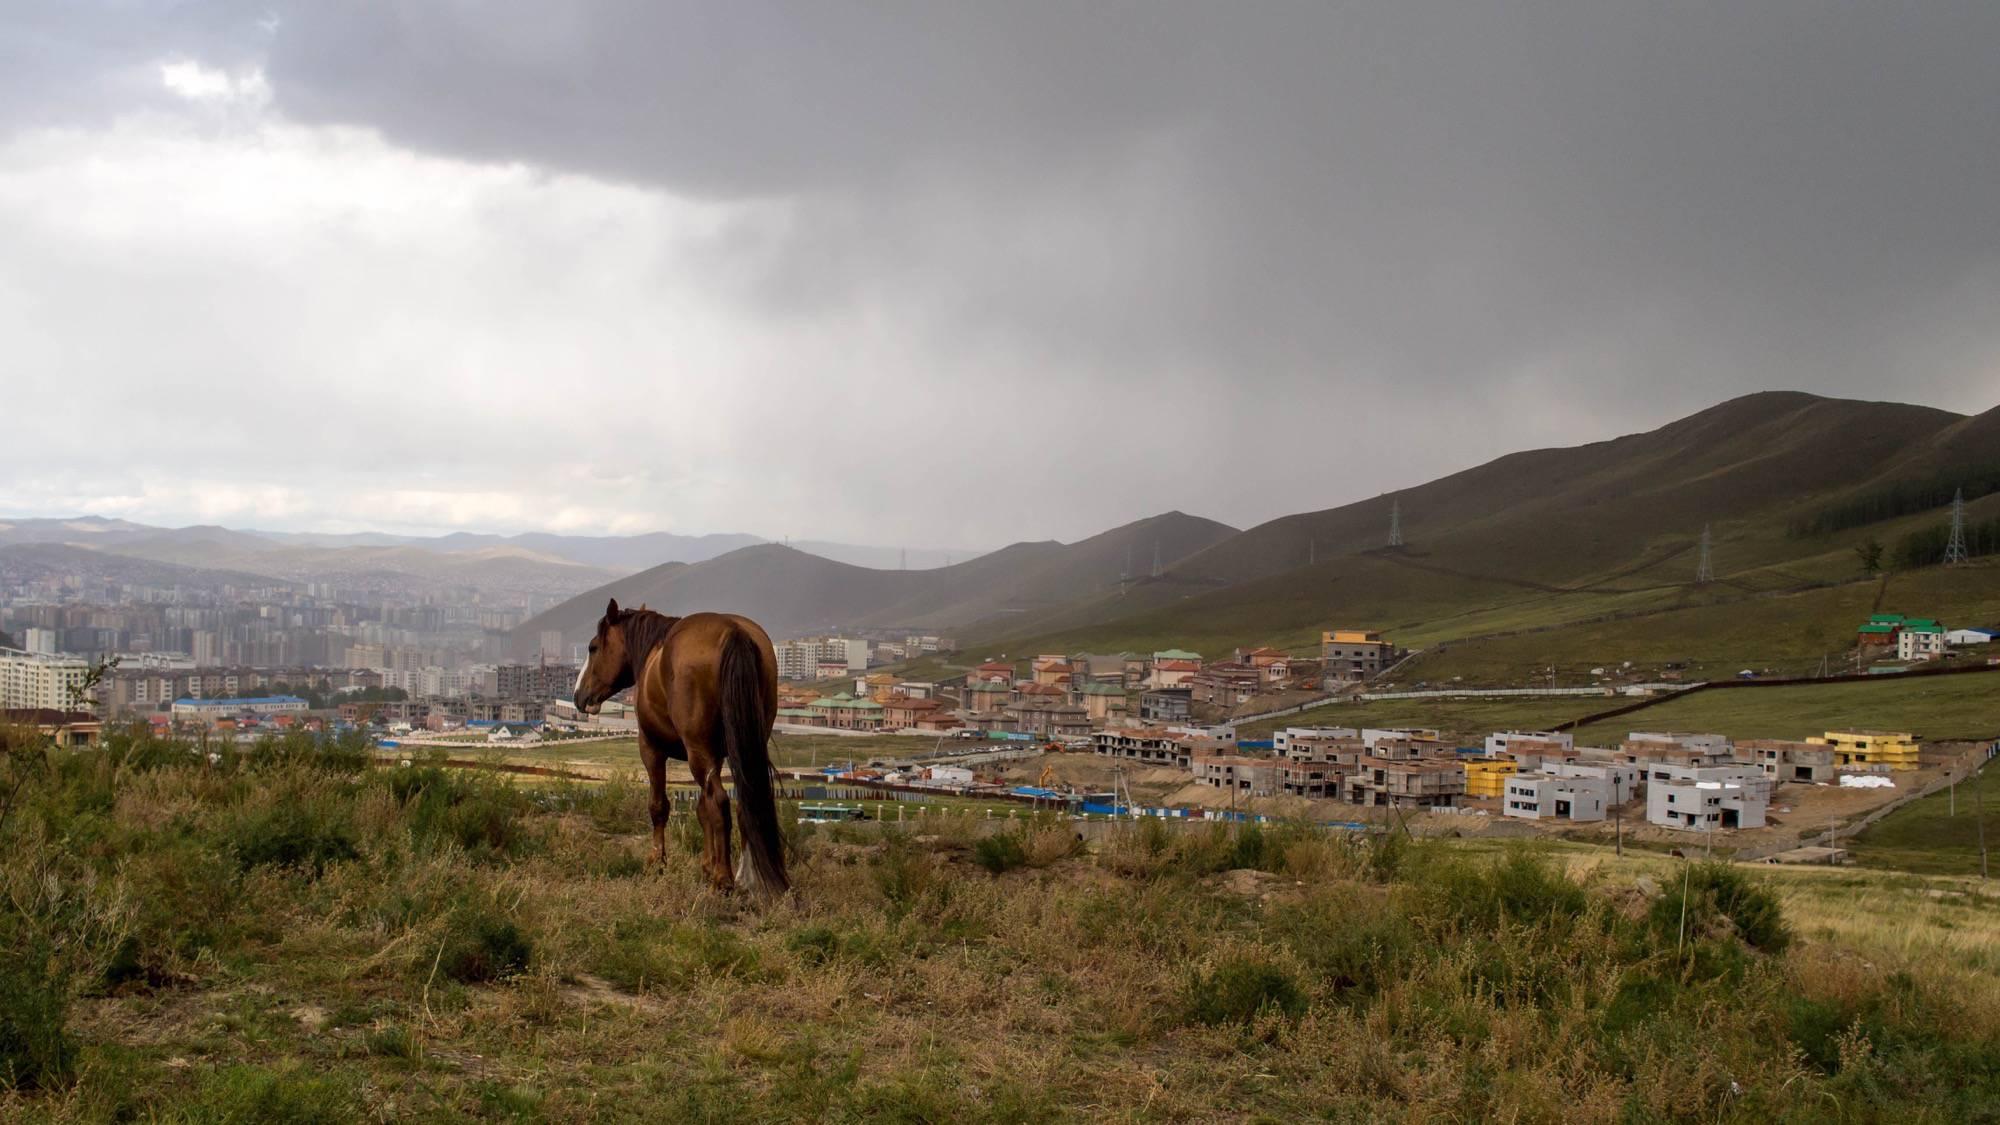 View on Ulaanbaatar from Bogd Khan